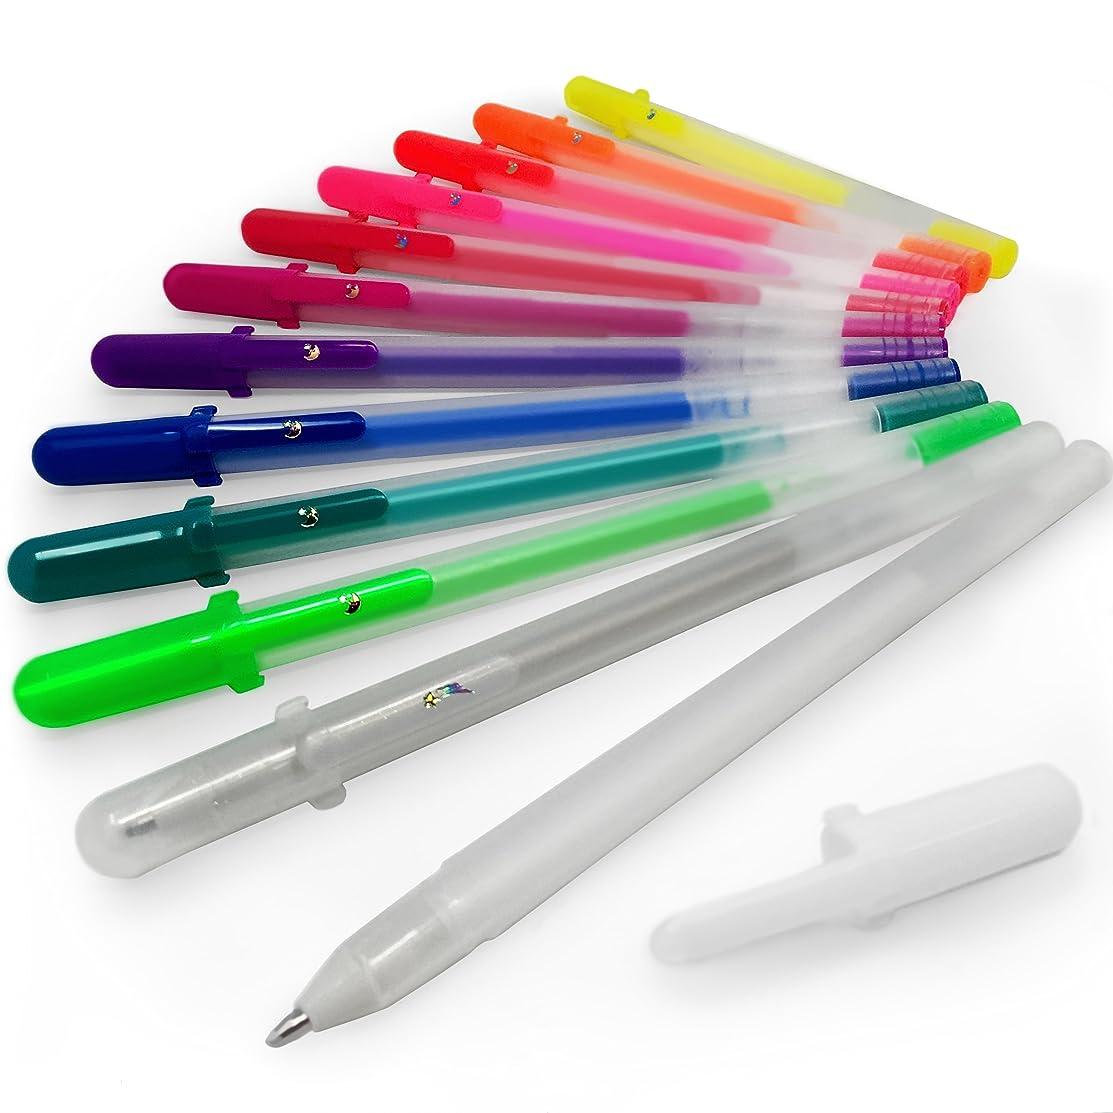 Sakura Gelly Roll Moonlight Fluorescent Gel Pens – Wallet of 12 Assorted Colours – SA 290